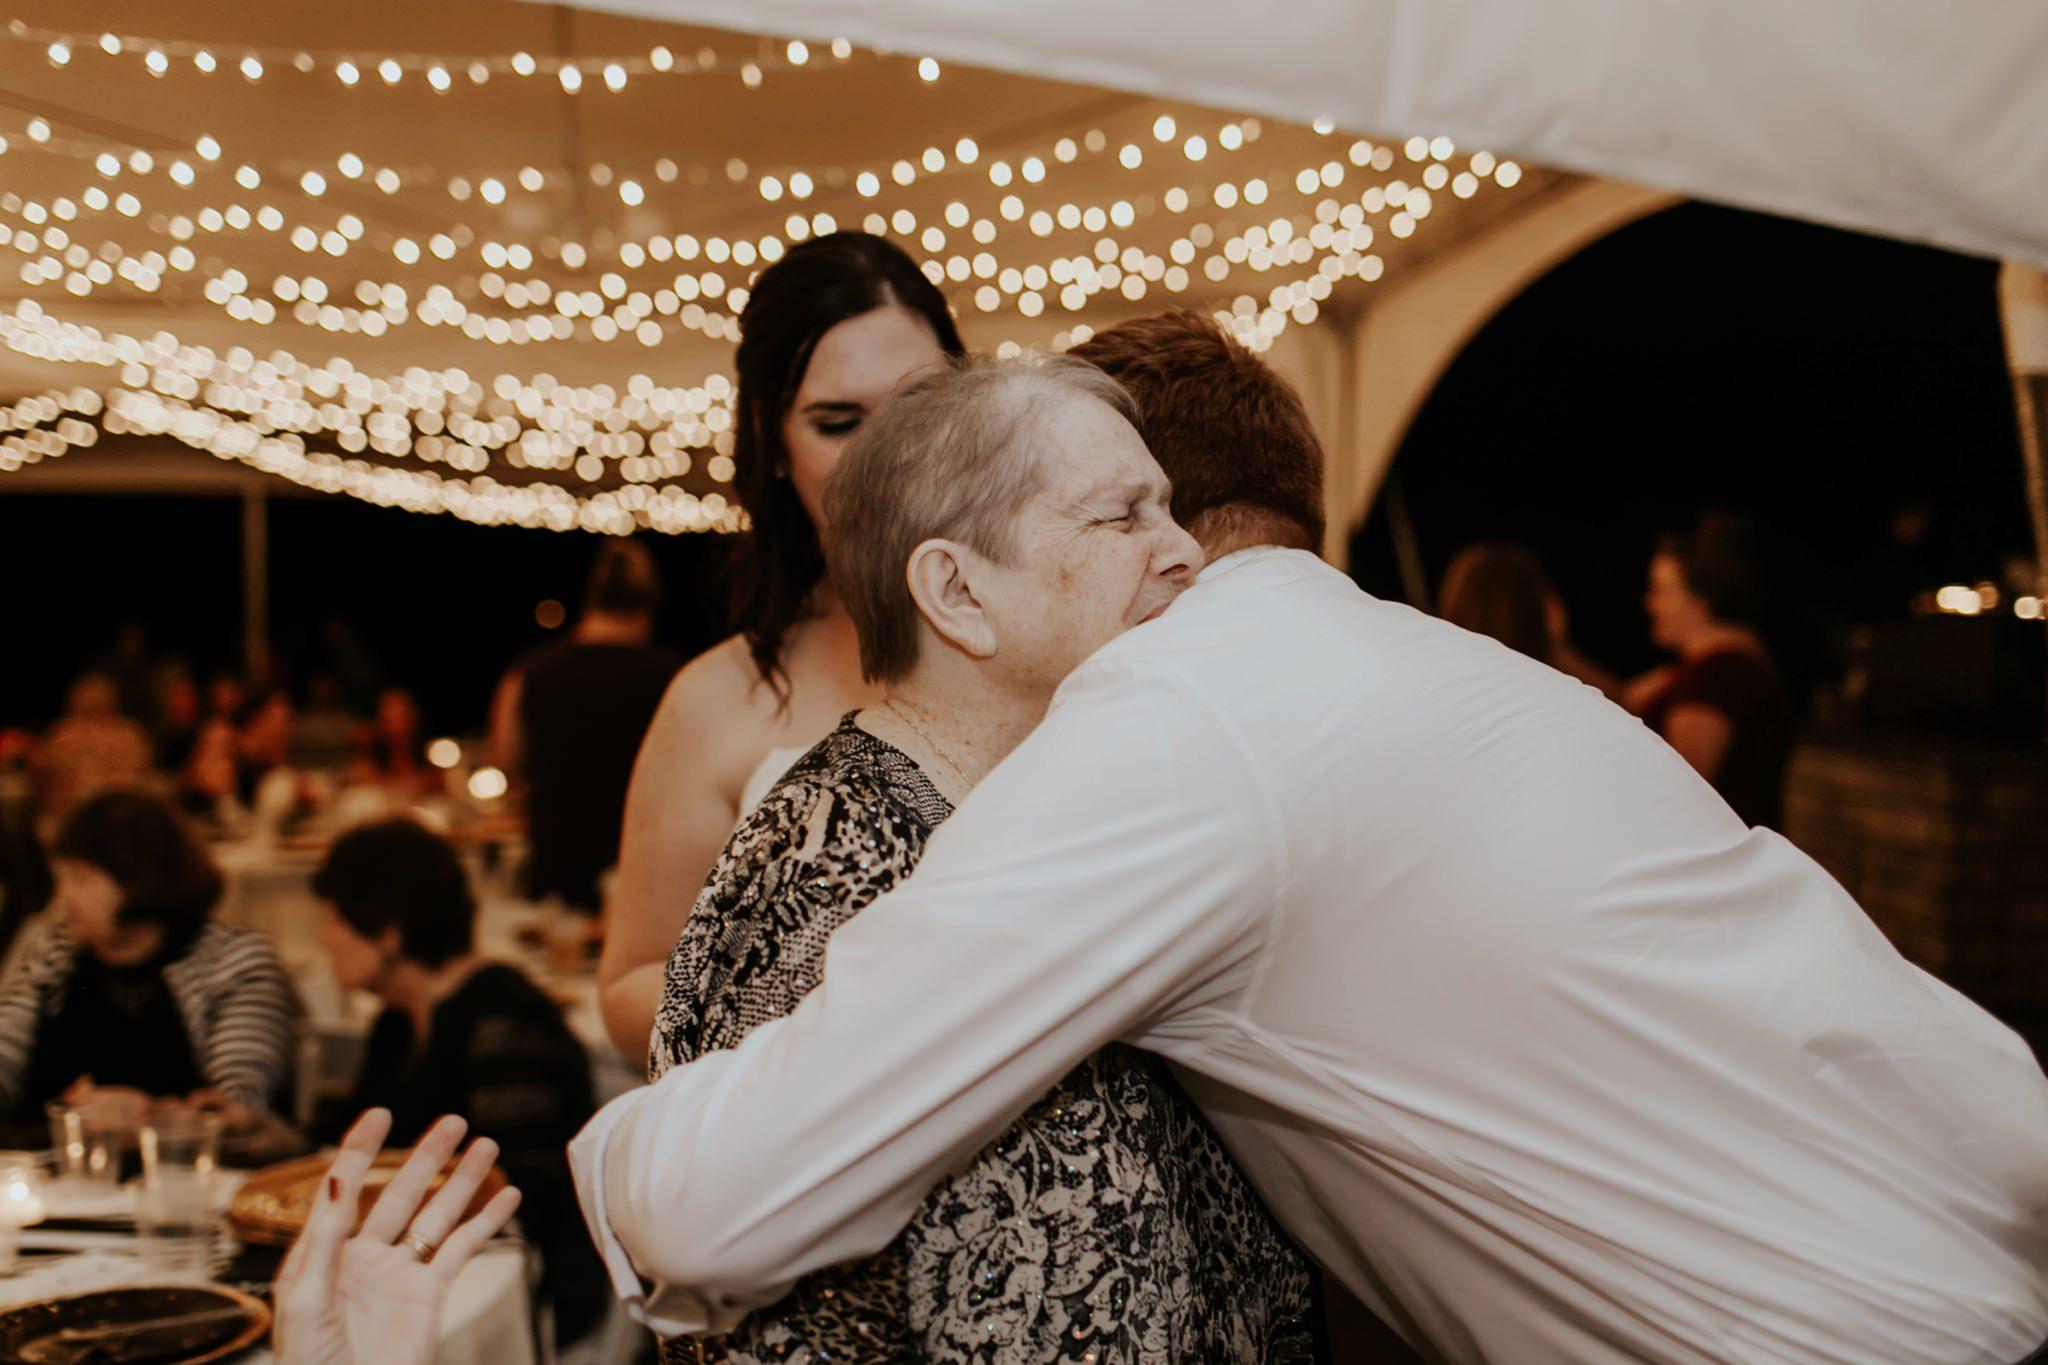 17-09-15 Lindsey and Brandon Wedding Edited-955_WEB.jpg